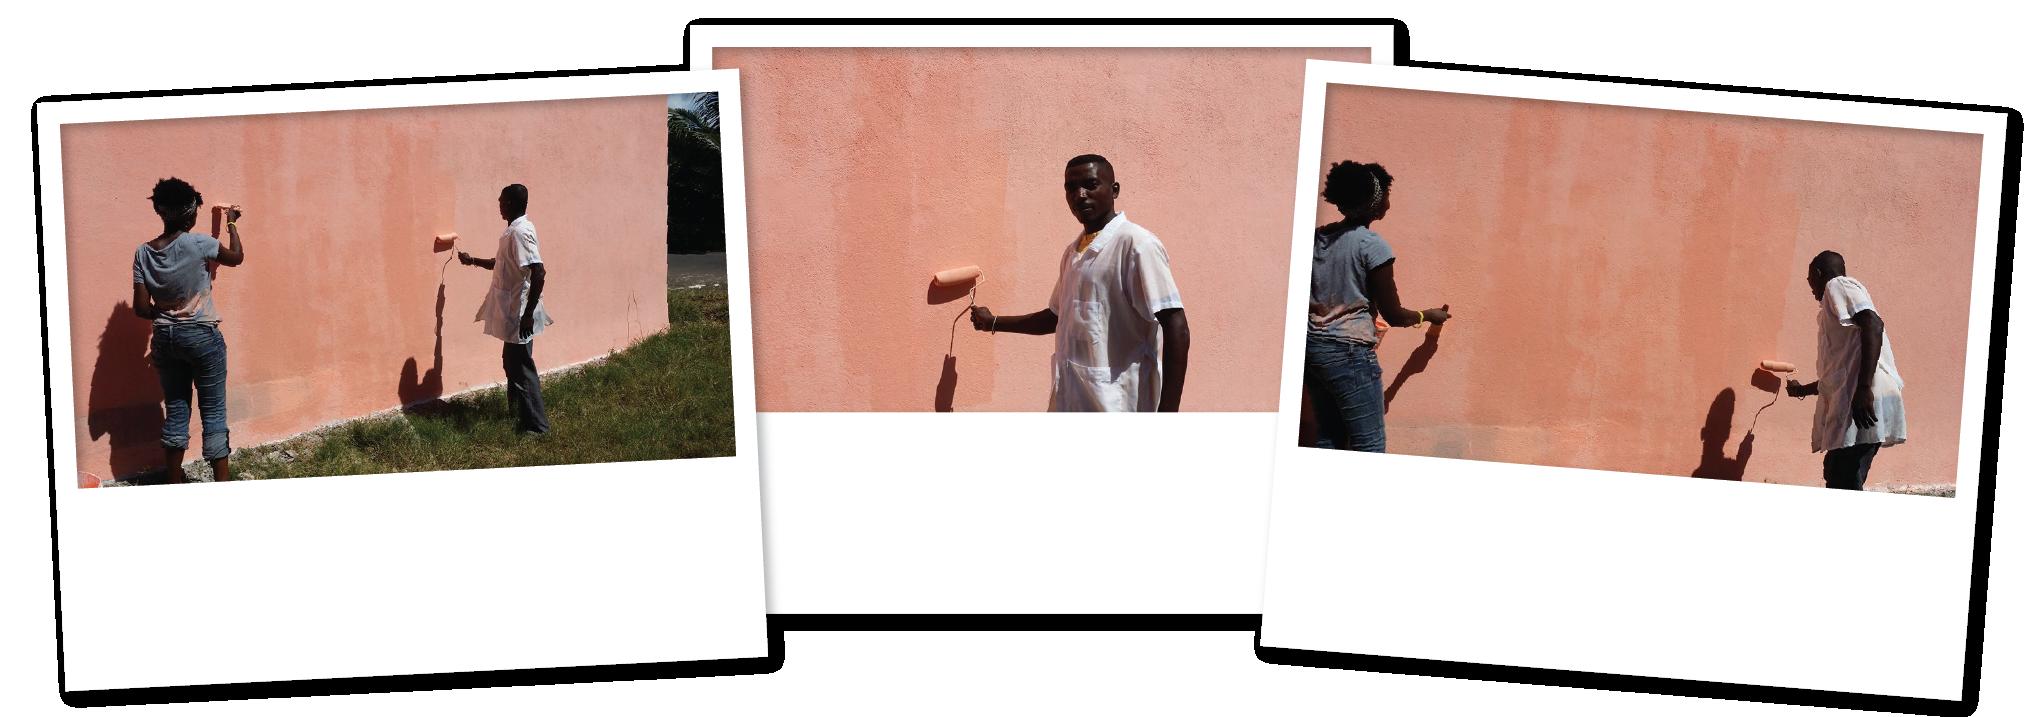 Teacher Helps Community Development Volunteers Rebuild SchoolEnglish Classes - Banana Village MRCI 2 copy 2